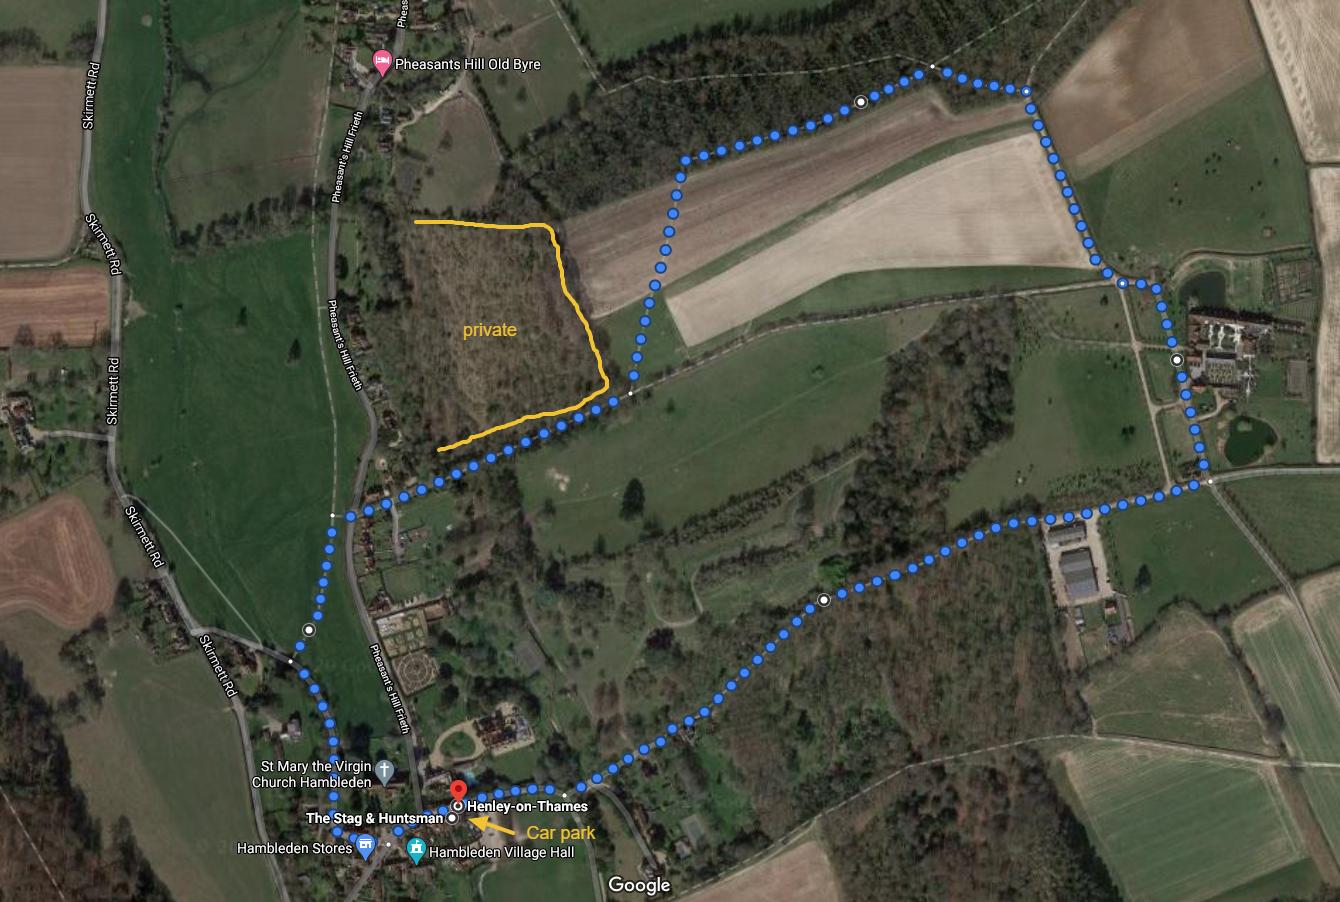 Pheasants Hill family walk map